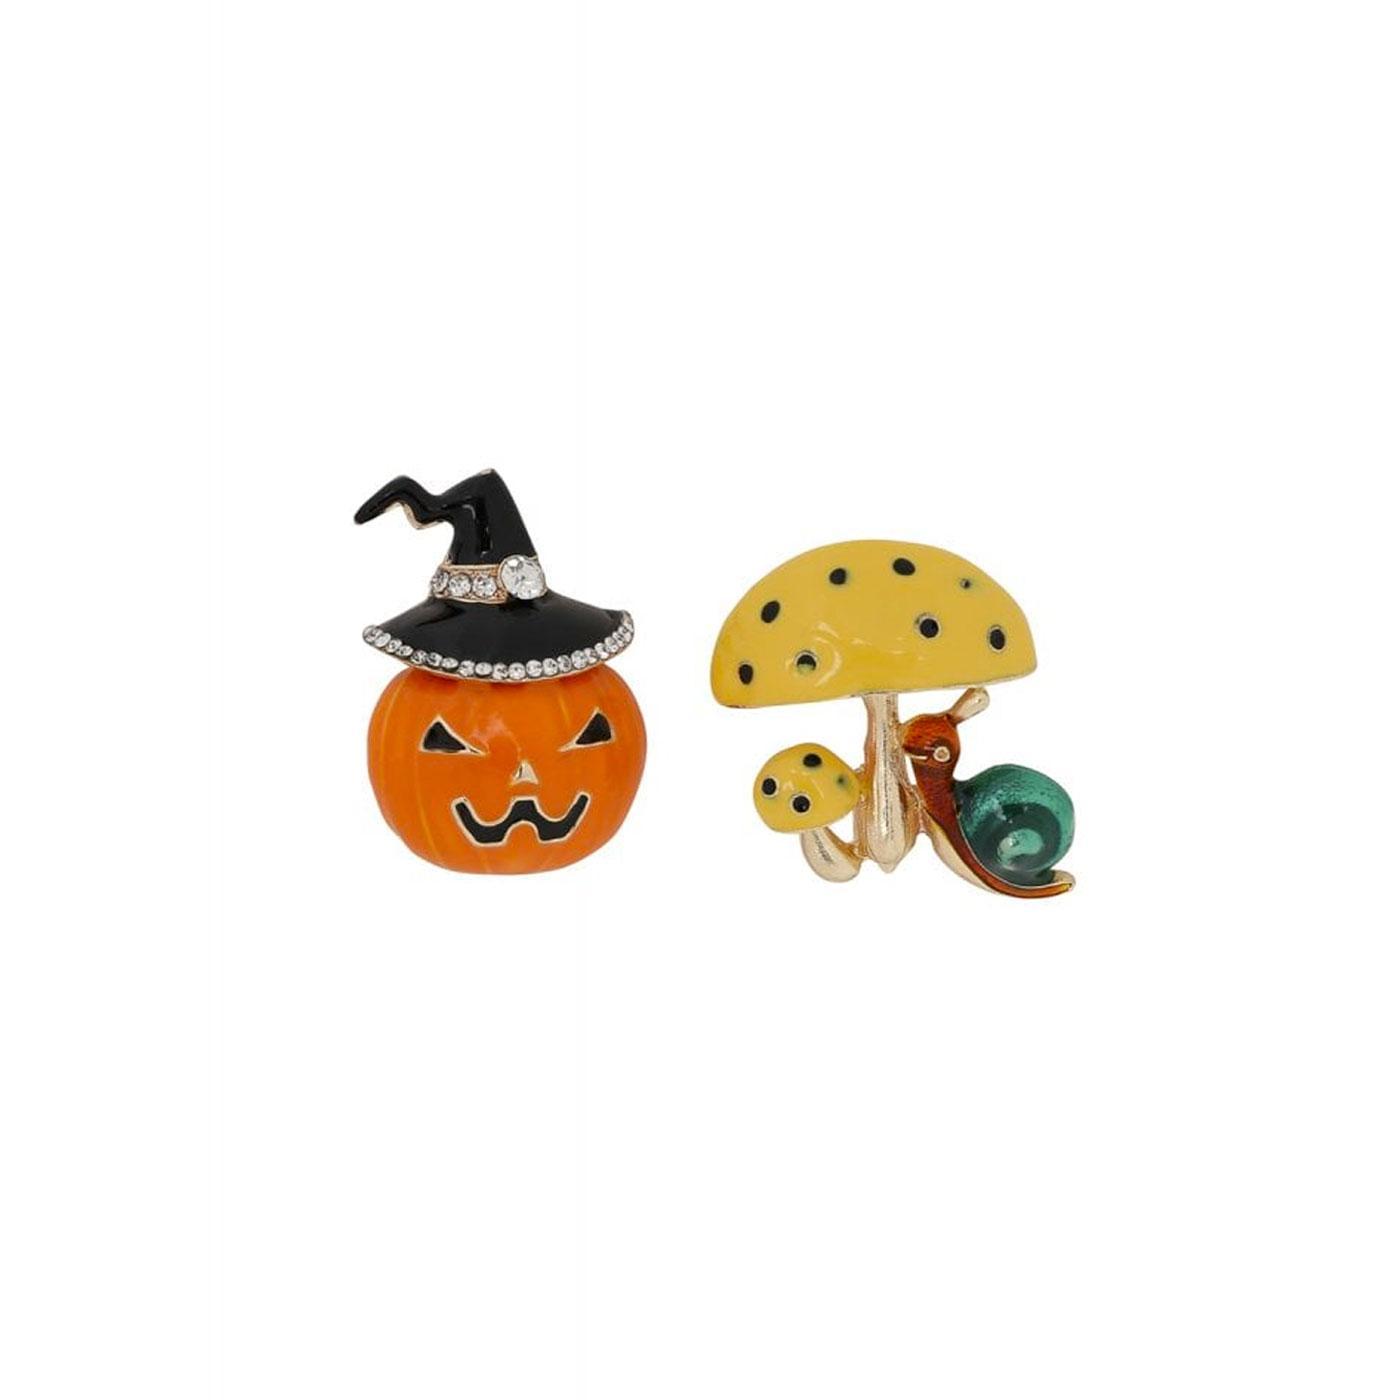 October COLLECTIF Pumpkin and Mushroom Brooch Set